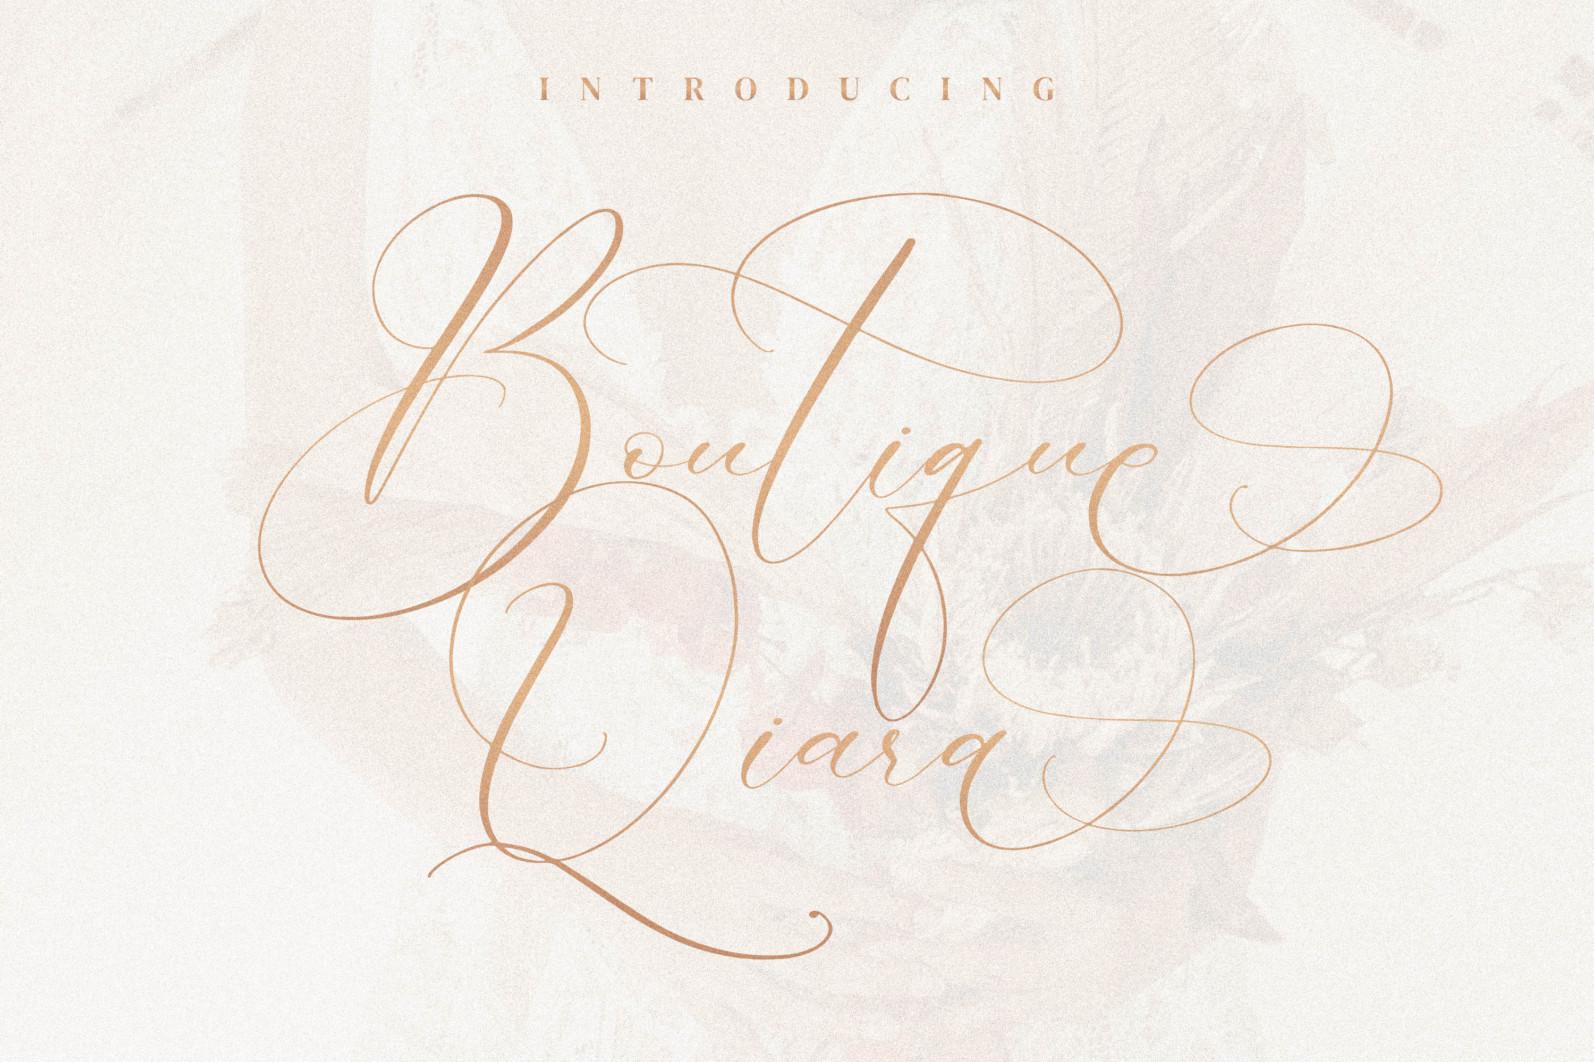 Boutique Qiara - Calligraphy Font - Boutique Q scaled -